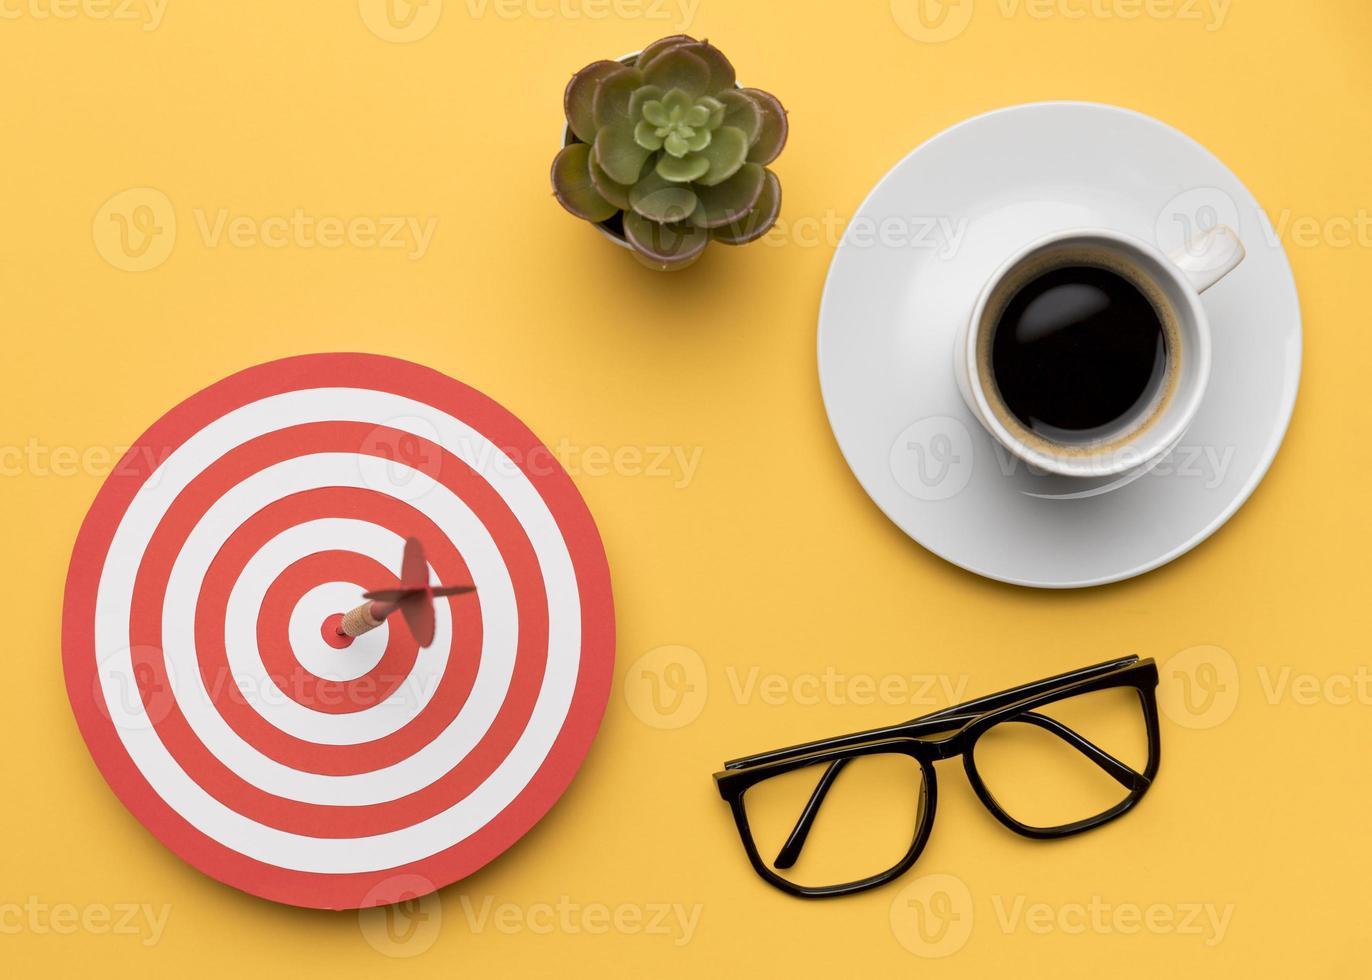 dartbord, glazen en een kopje koffie foto